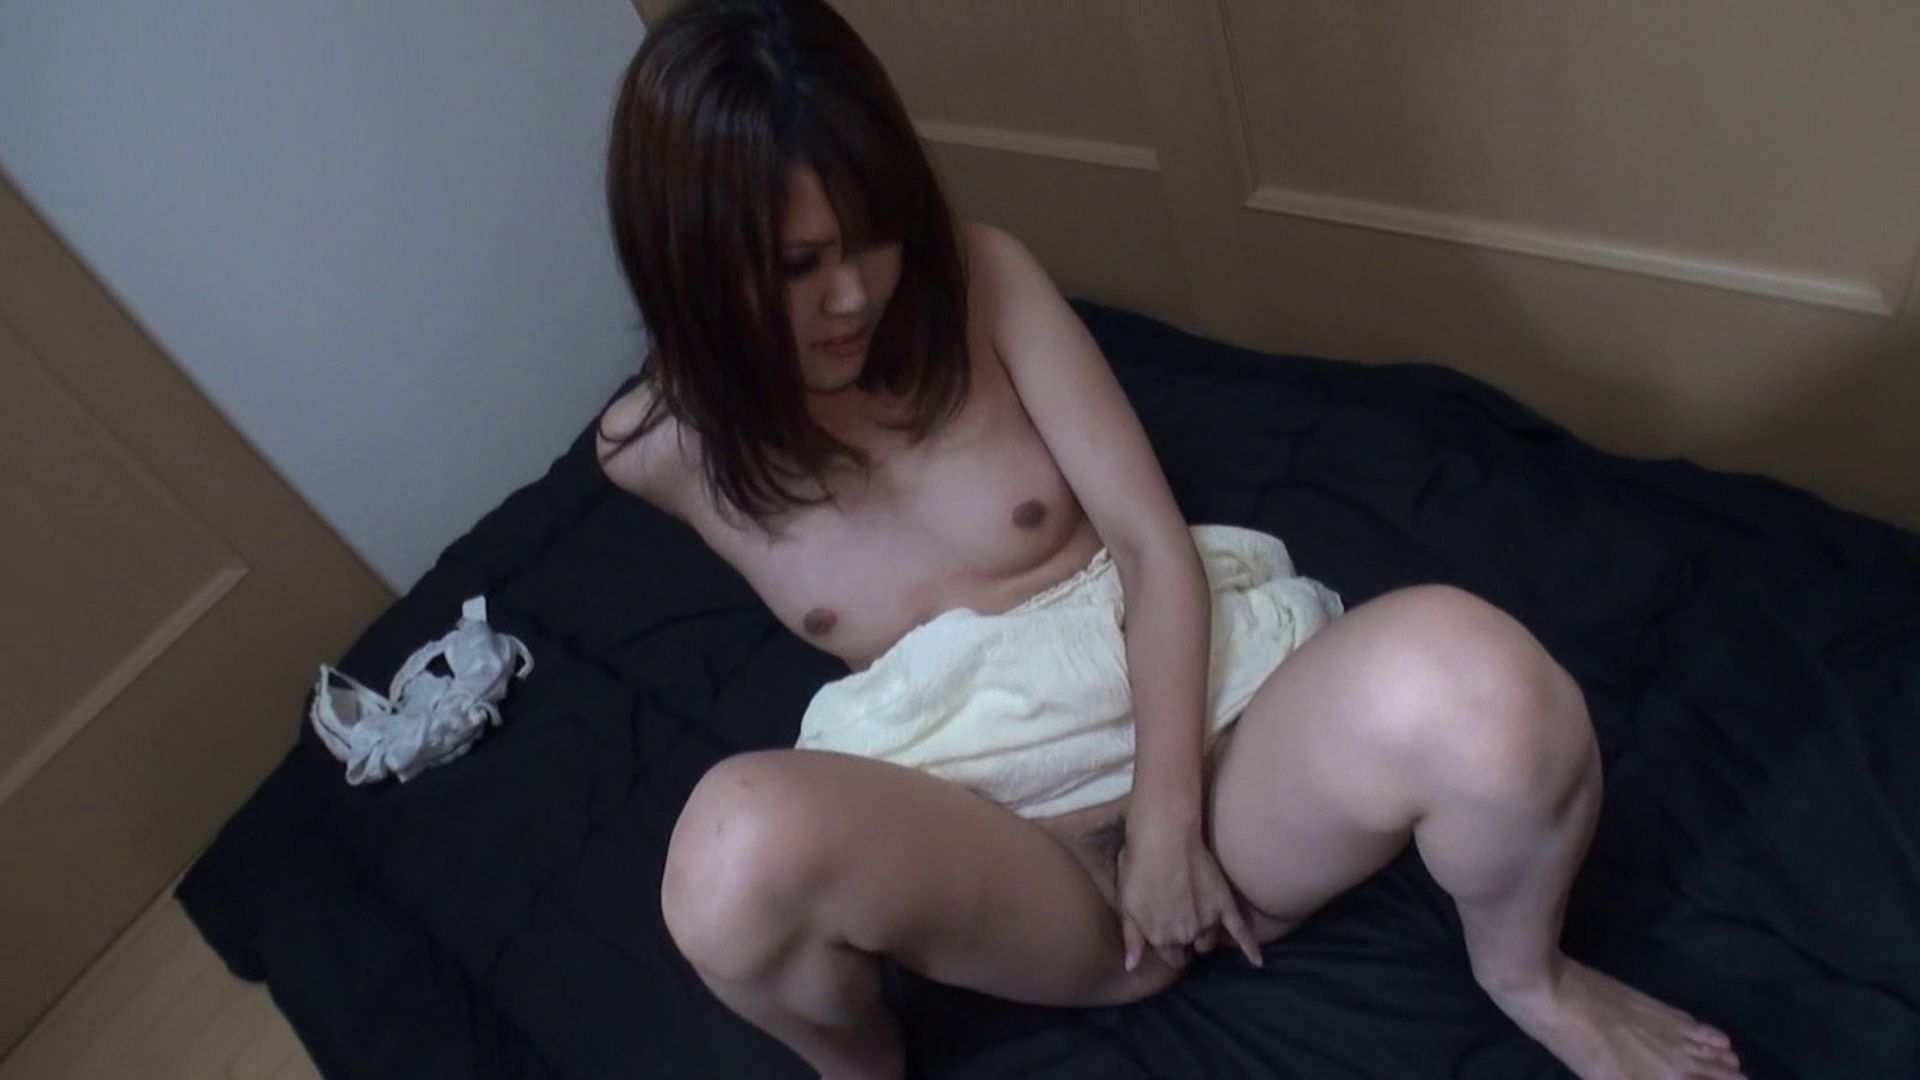 S級厳選美女ビッチガールVol.50 前編 美女のヌード スケベ動画紹介 55画像 52